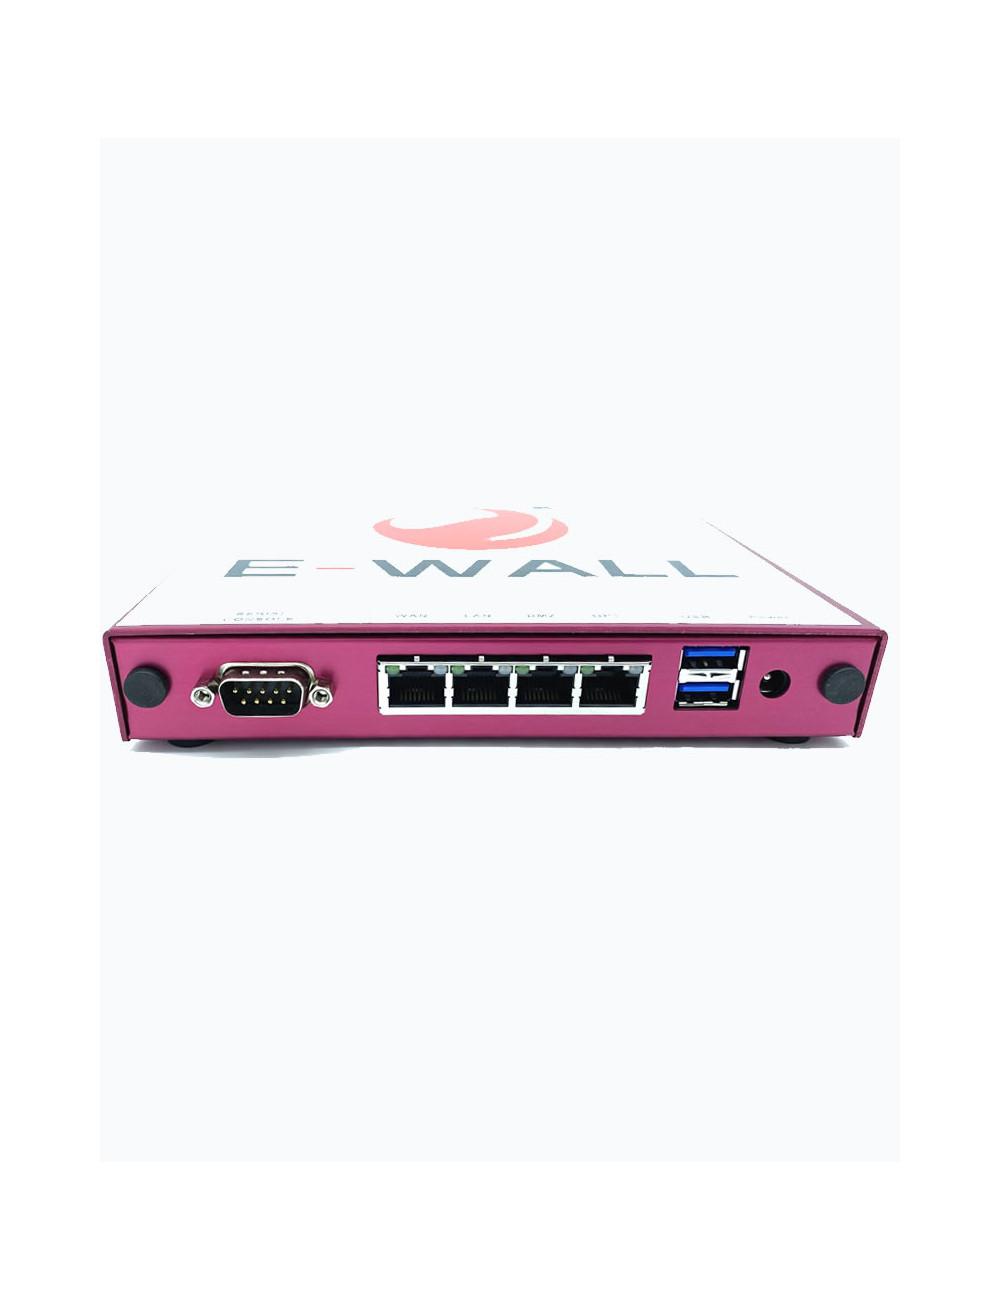 E-WALL SYNOLOGY Serveur NAS - Sauvegarde 500 Go - 1 an